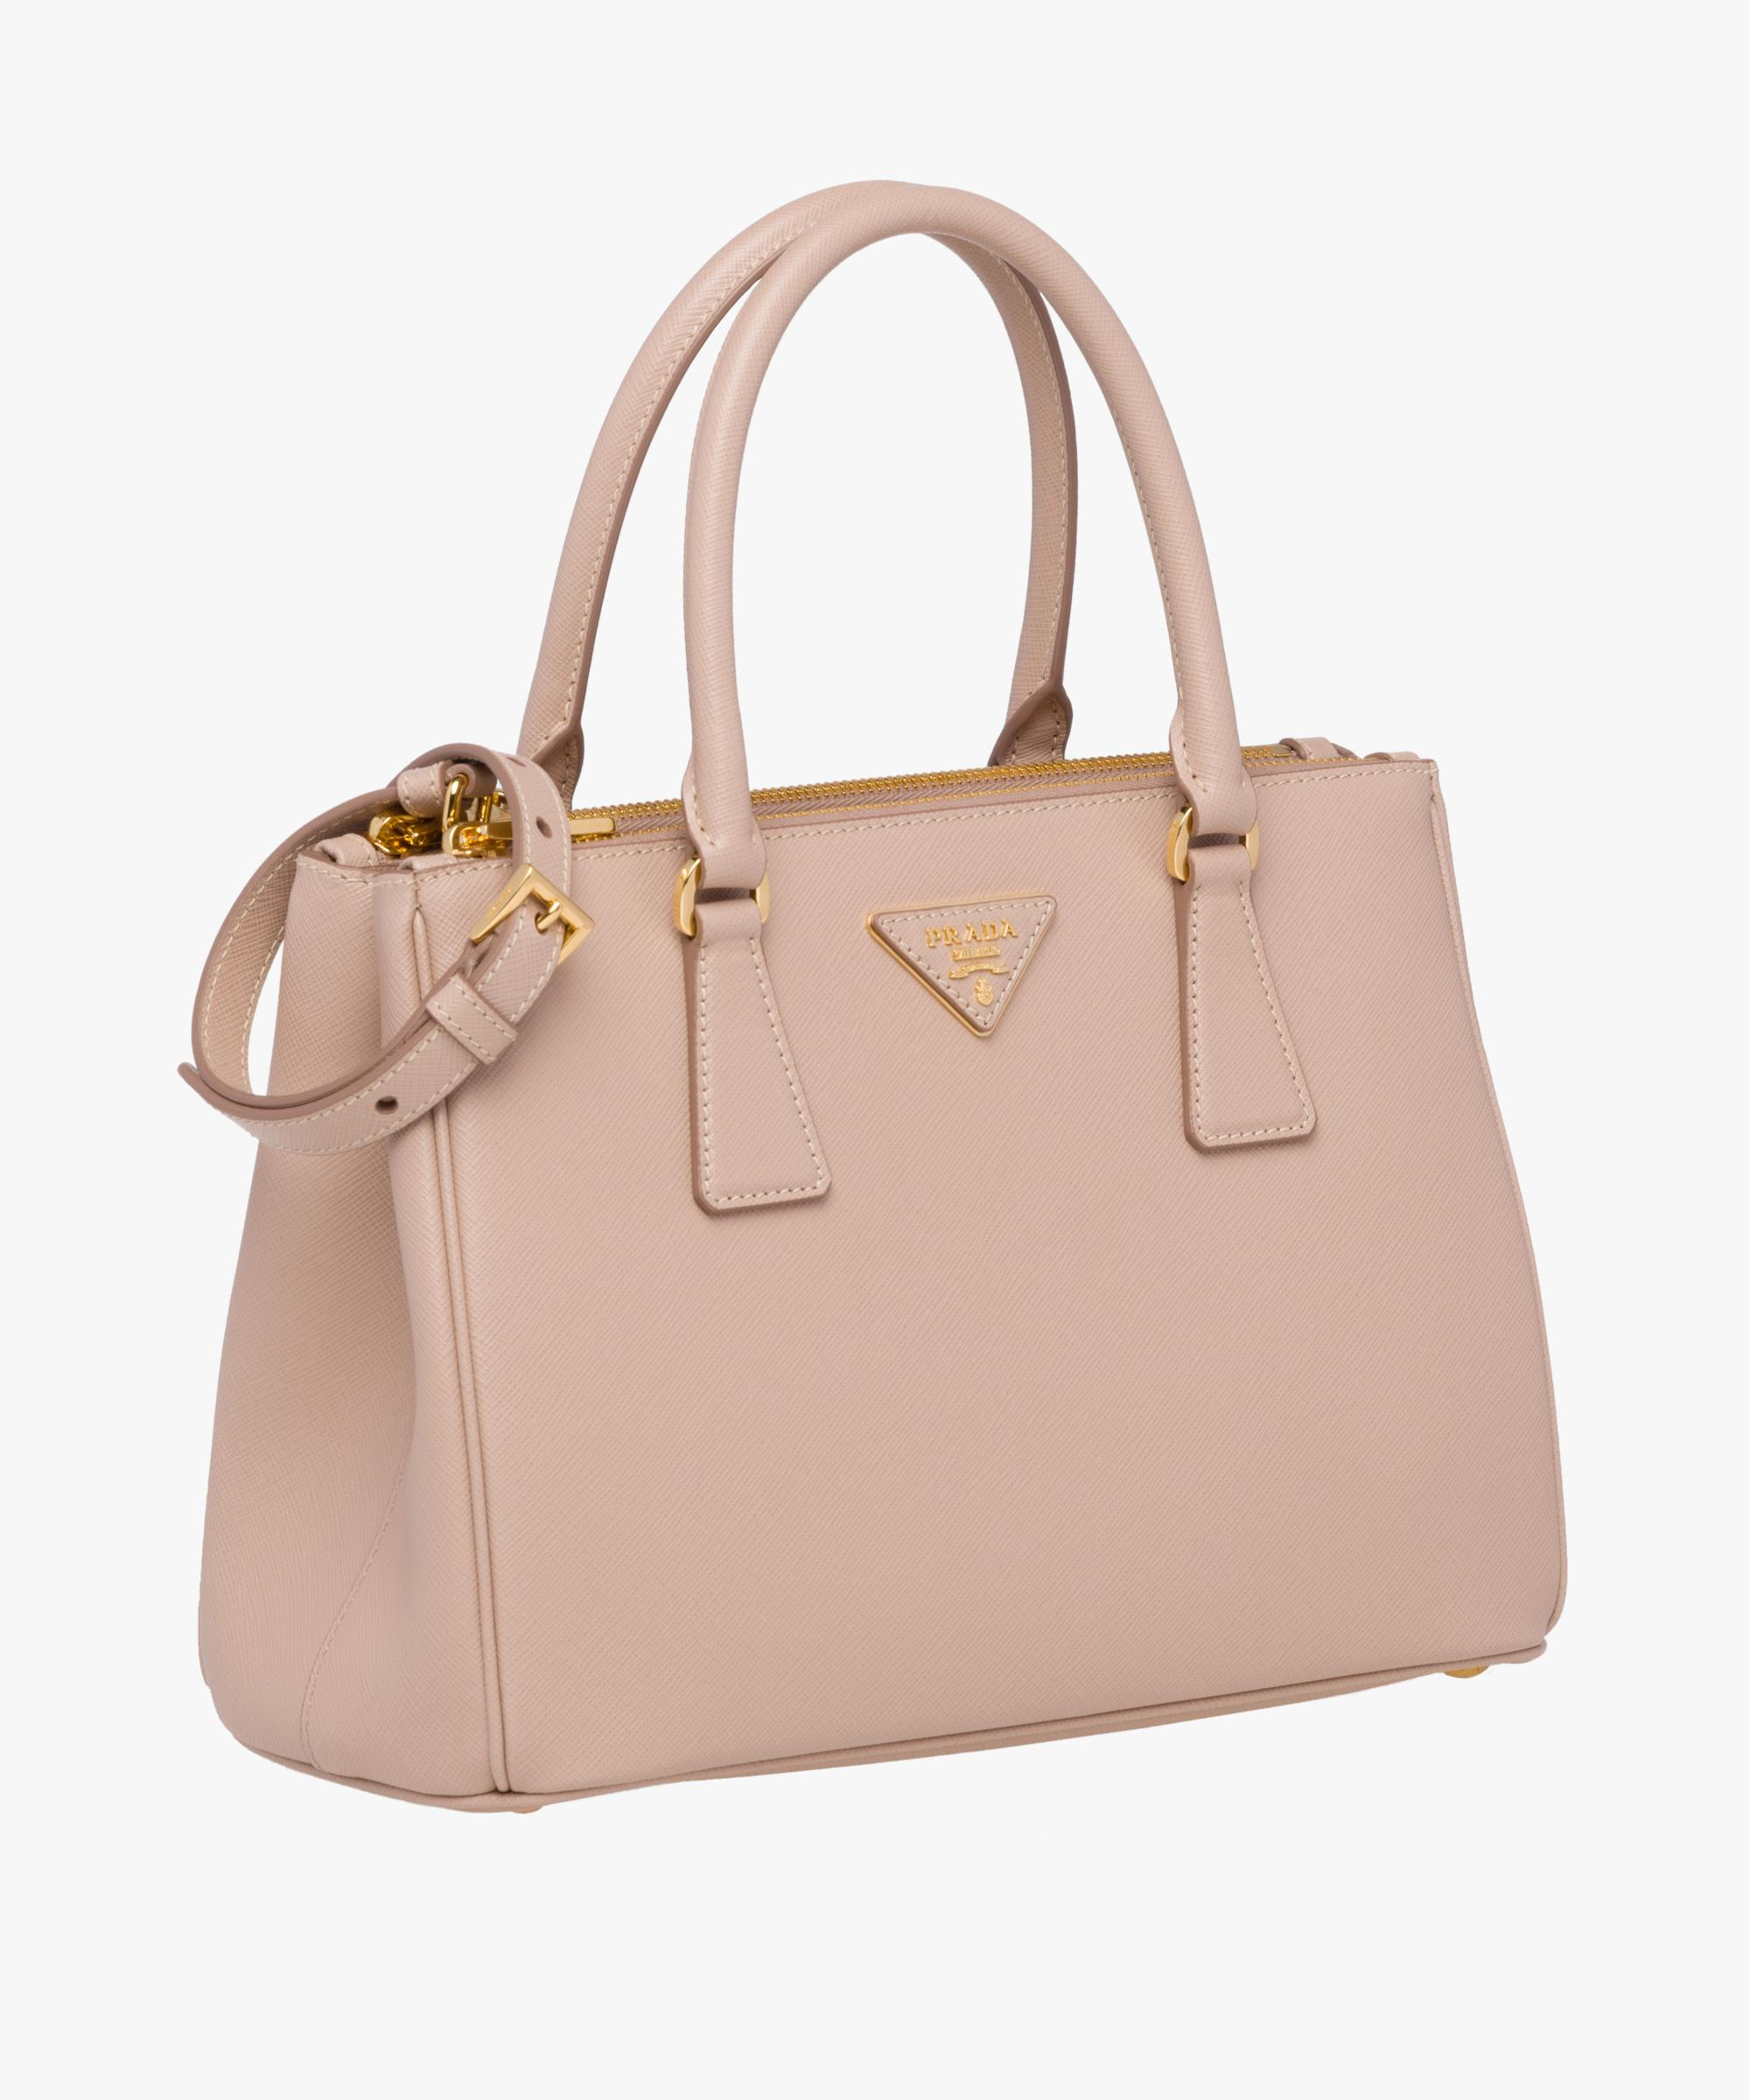 5605a93786d8 ... usa lyst prada galleria saffiano leather bag in pink bf89a cd2dd